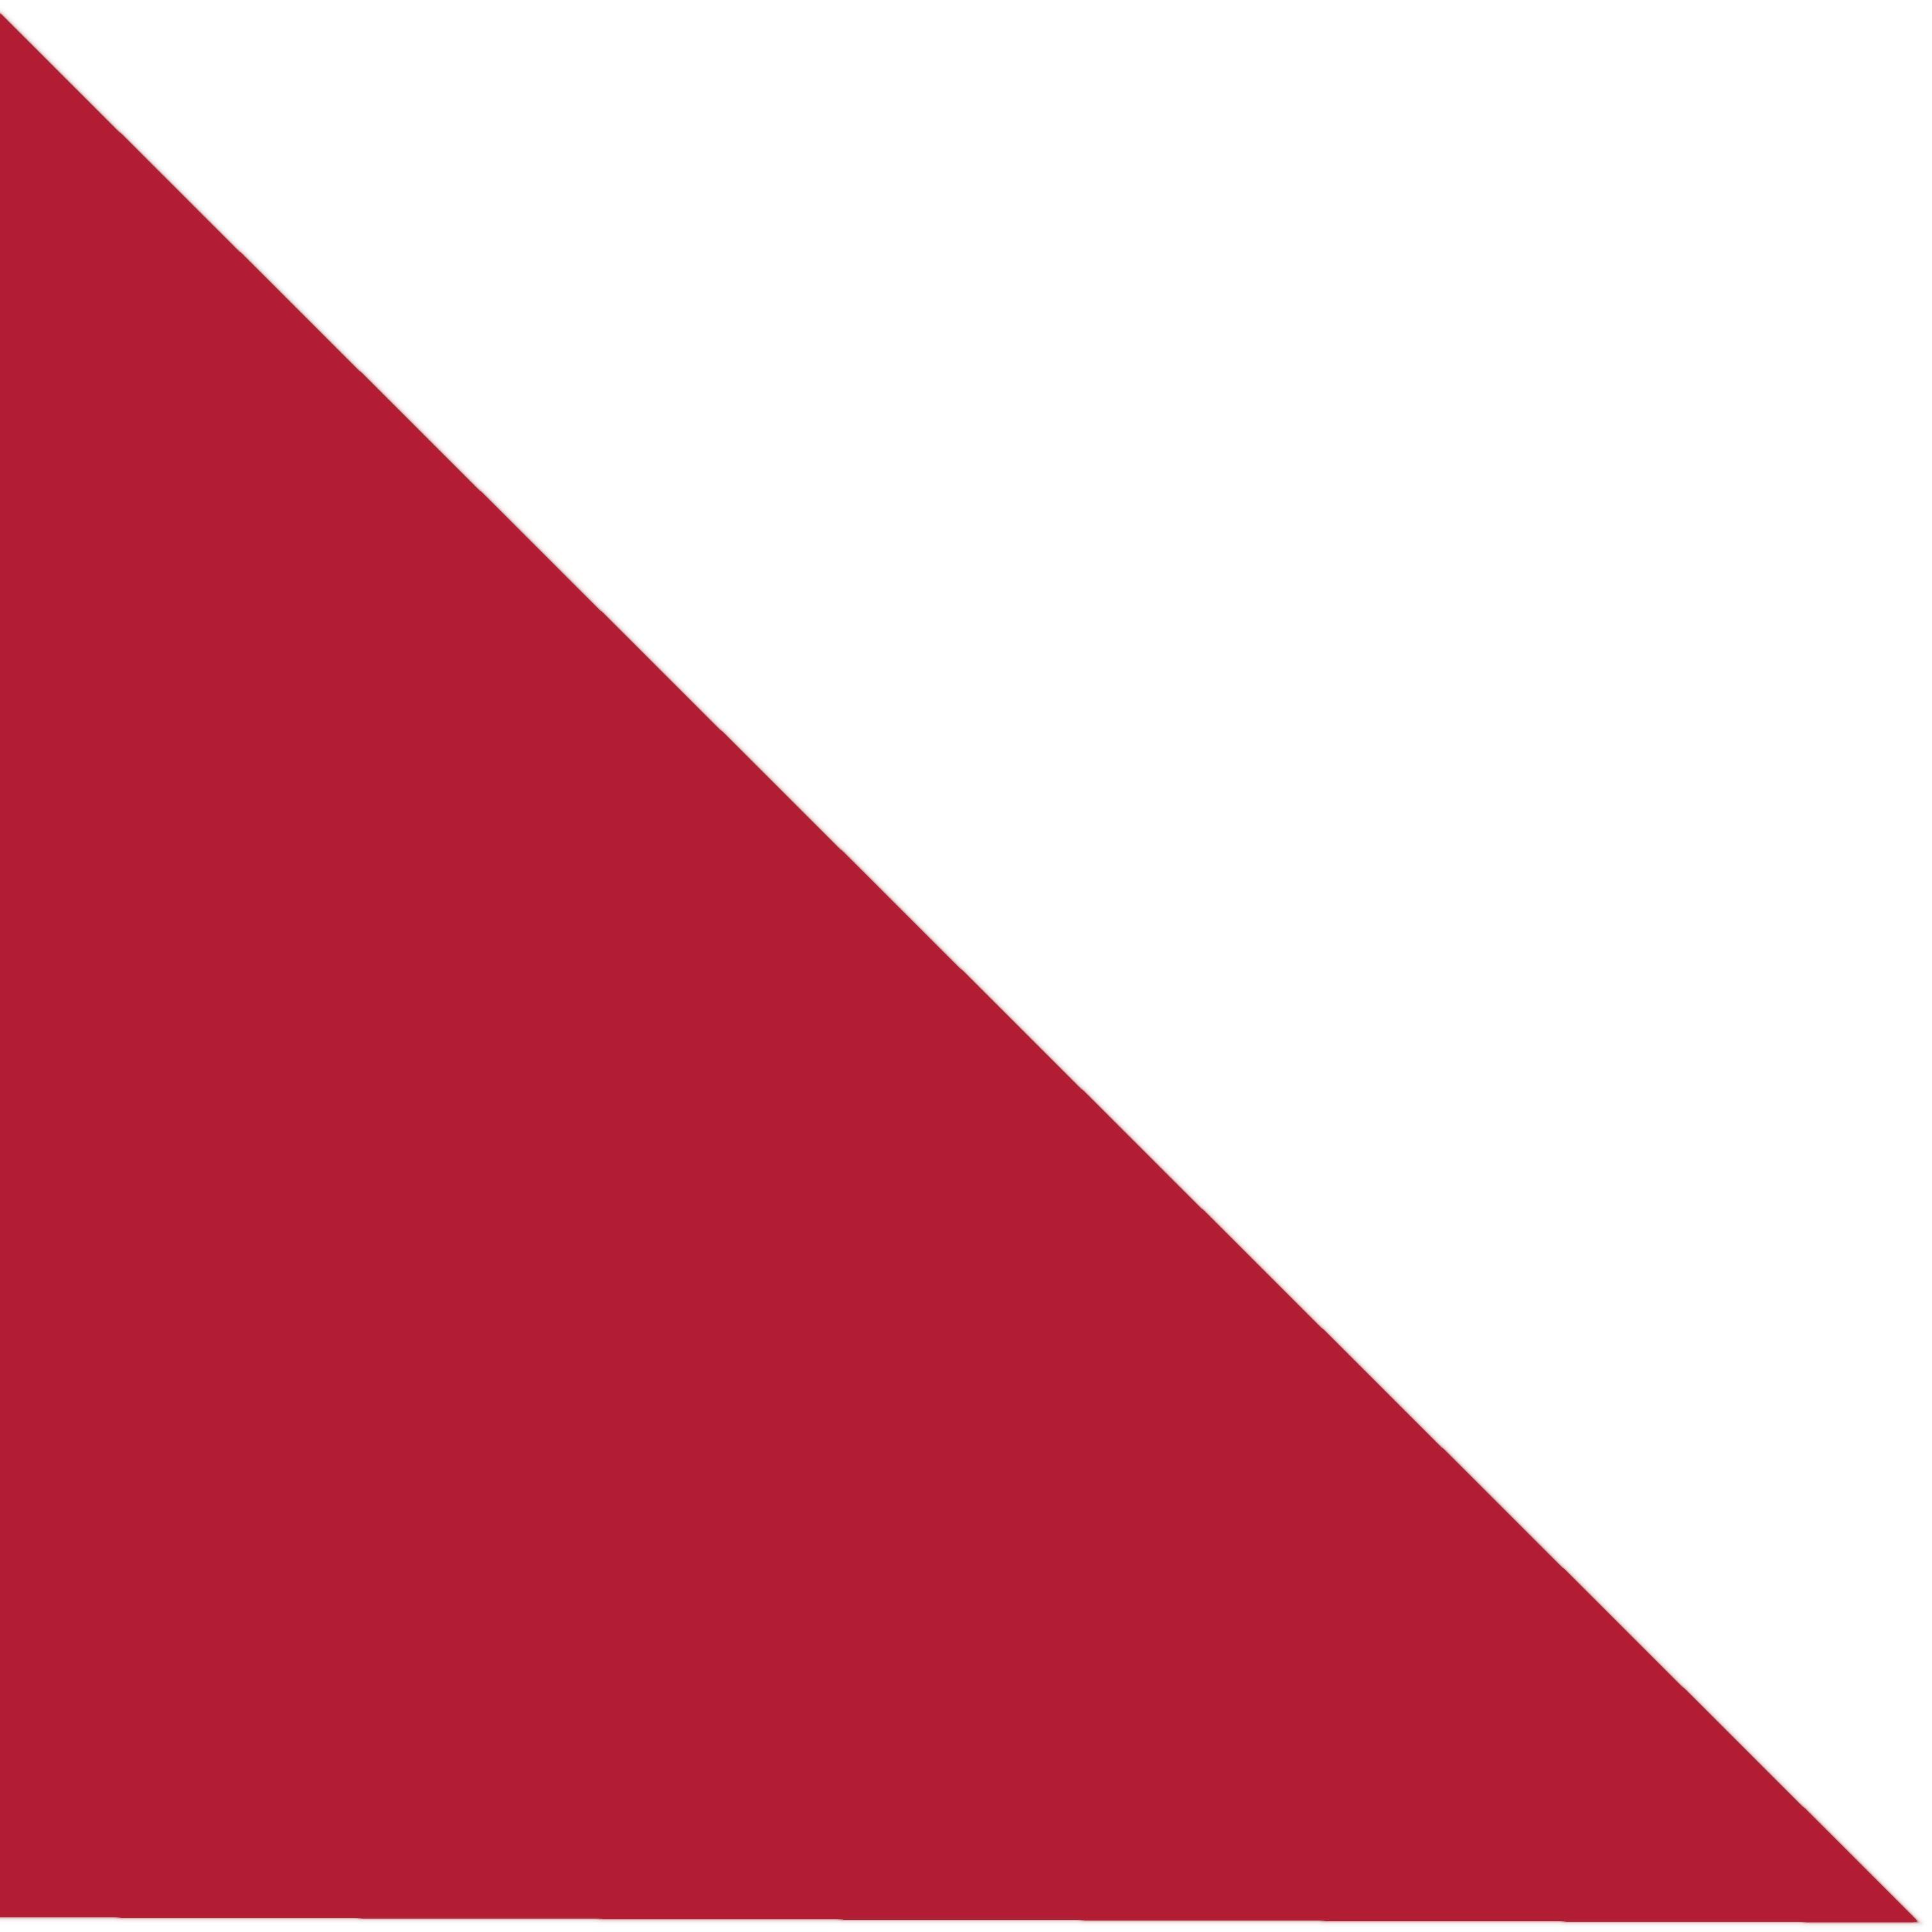 Červené s  bílým proužkem